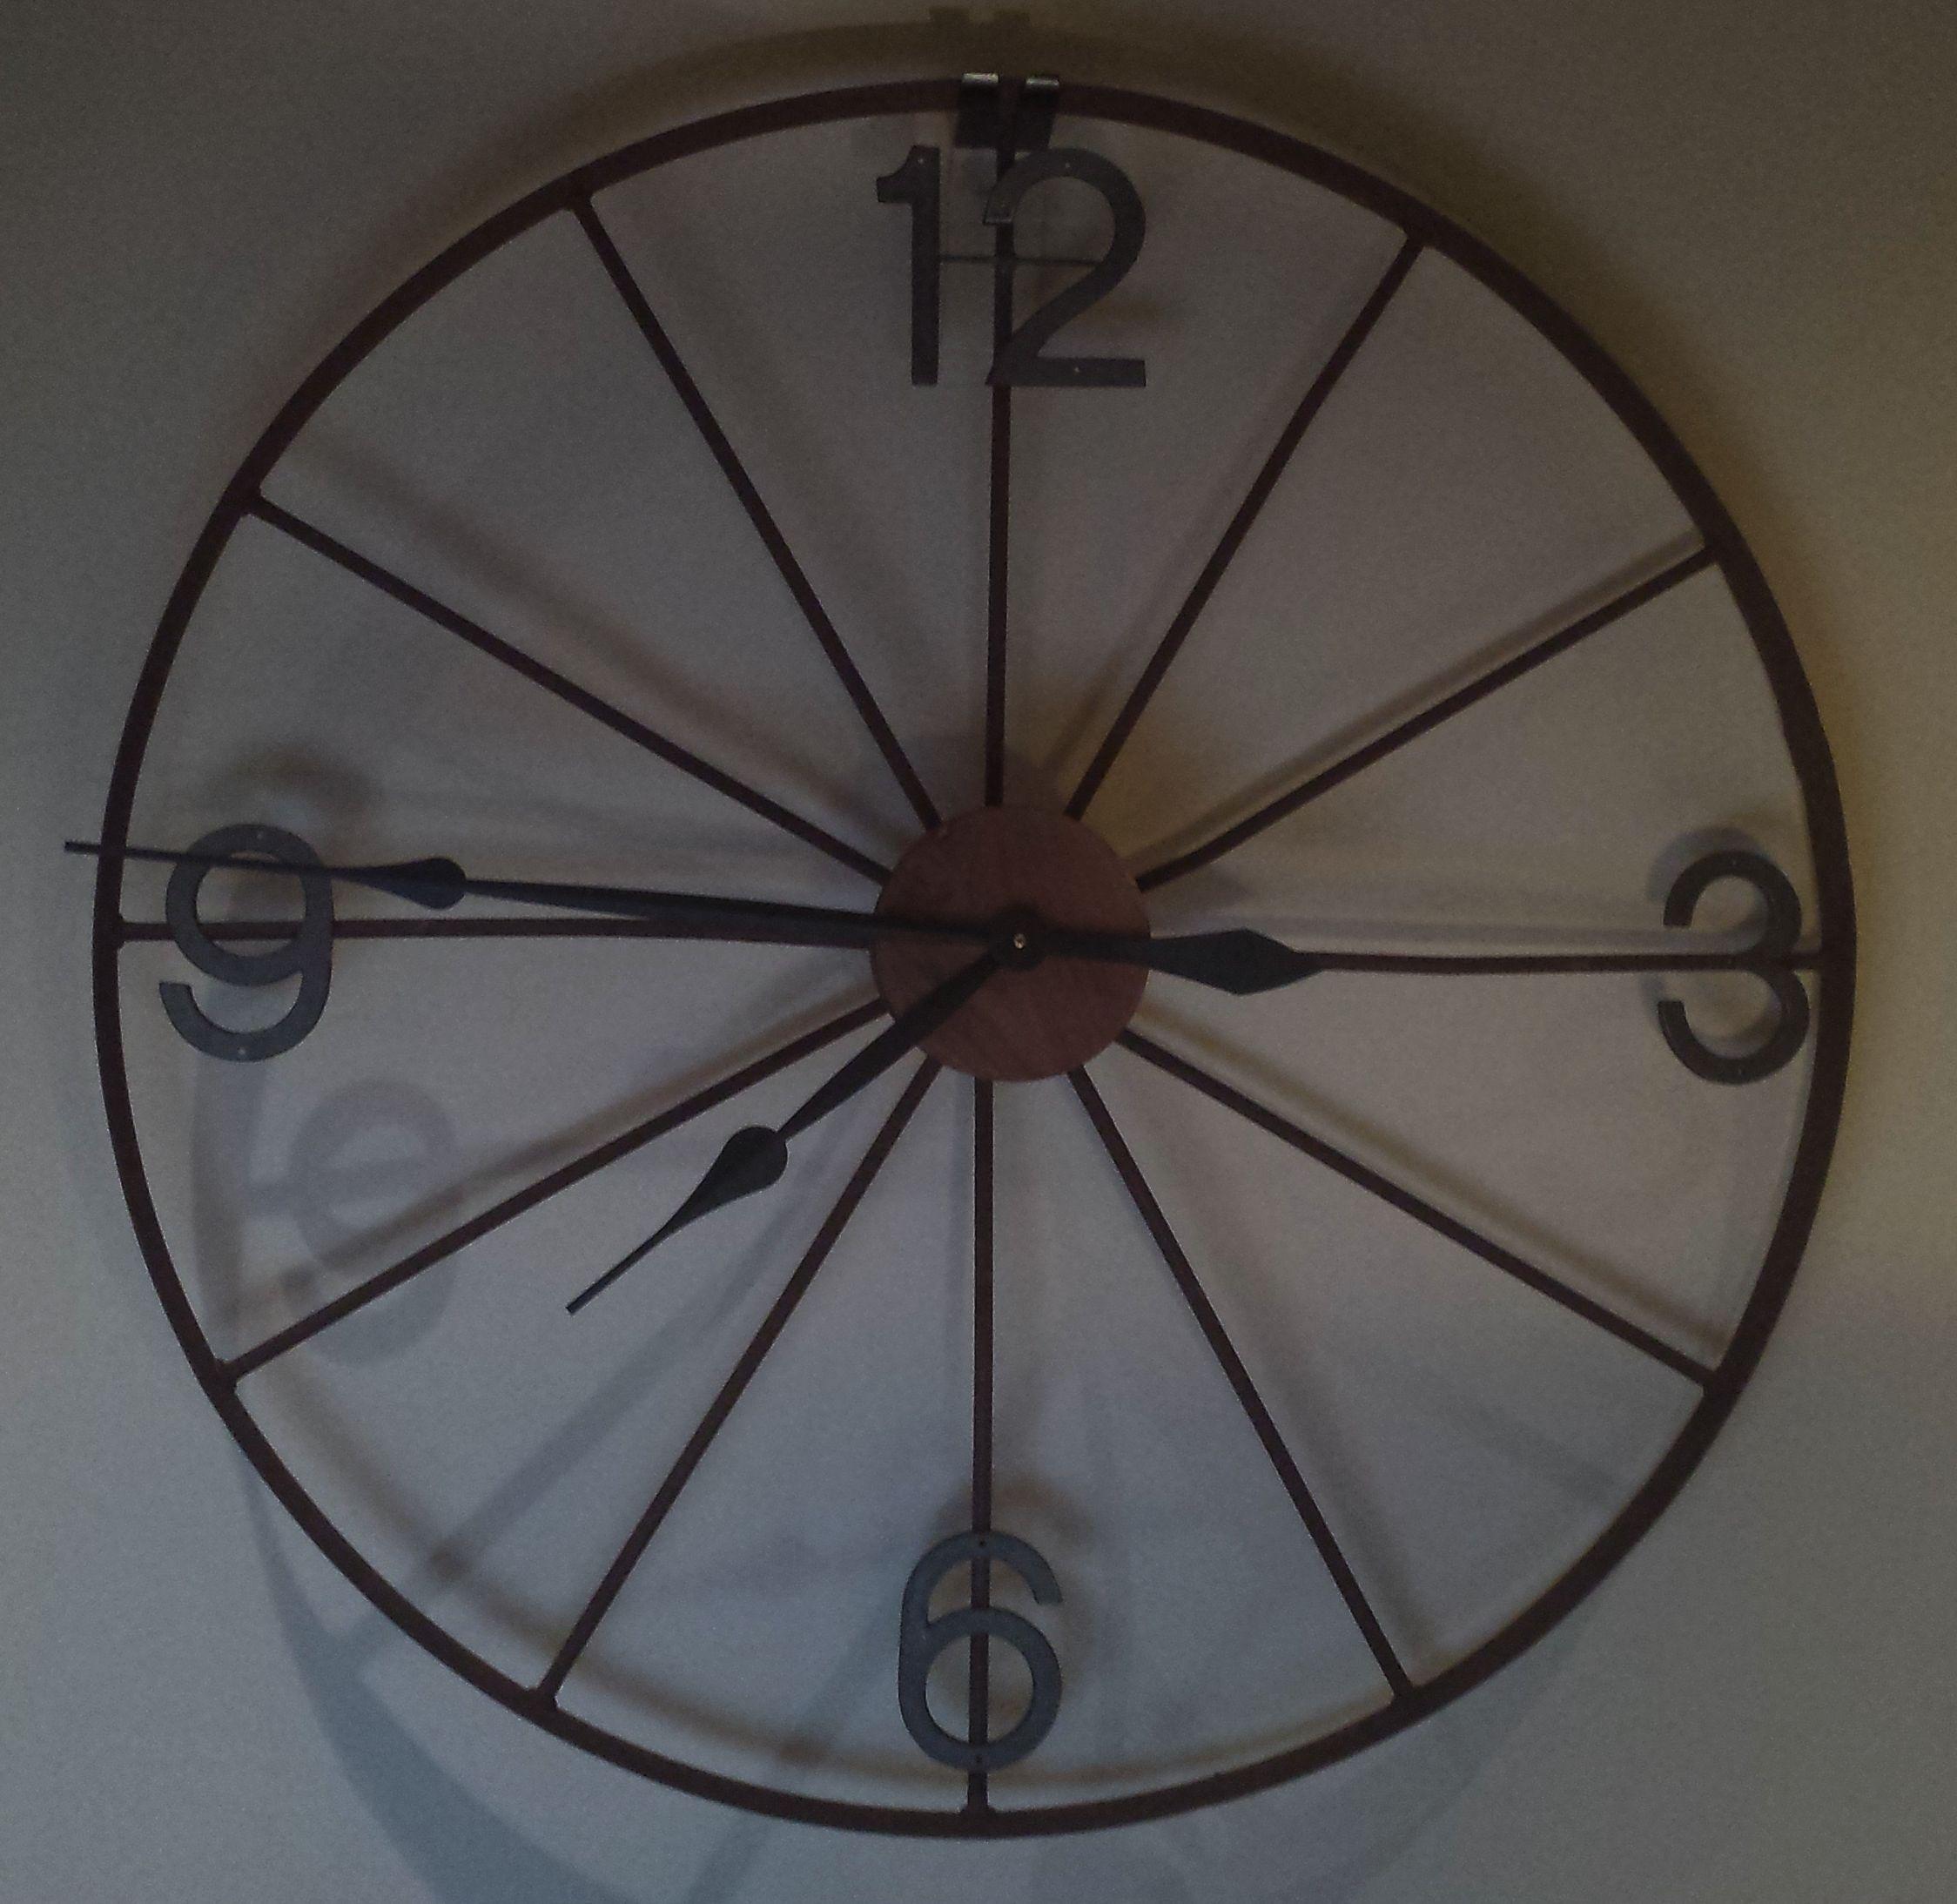 Wagon Wheel Clock | Projects To Try | Wagon Wheel Decor, Diy throughout Millanocket Metal Wheel Photo Holder Wall Decor (Image 30 of 30)